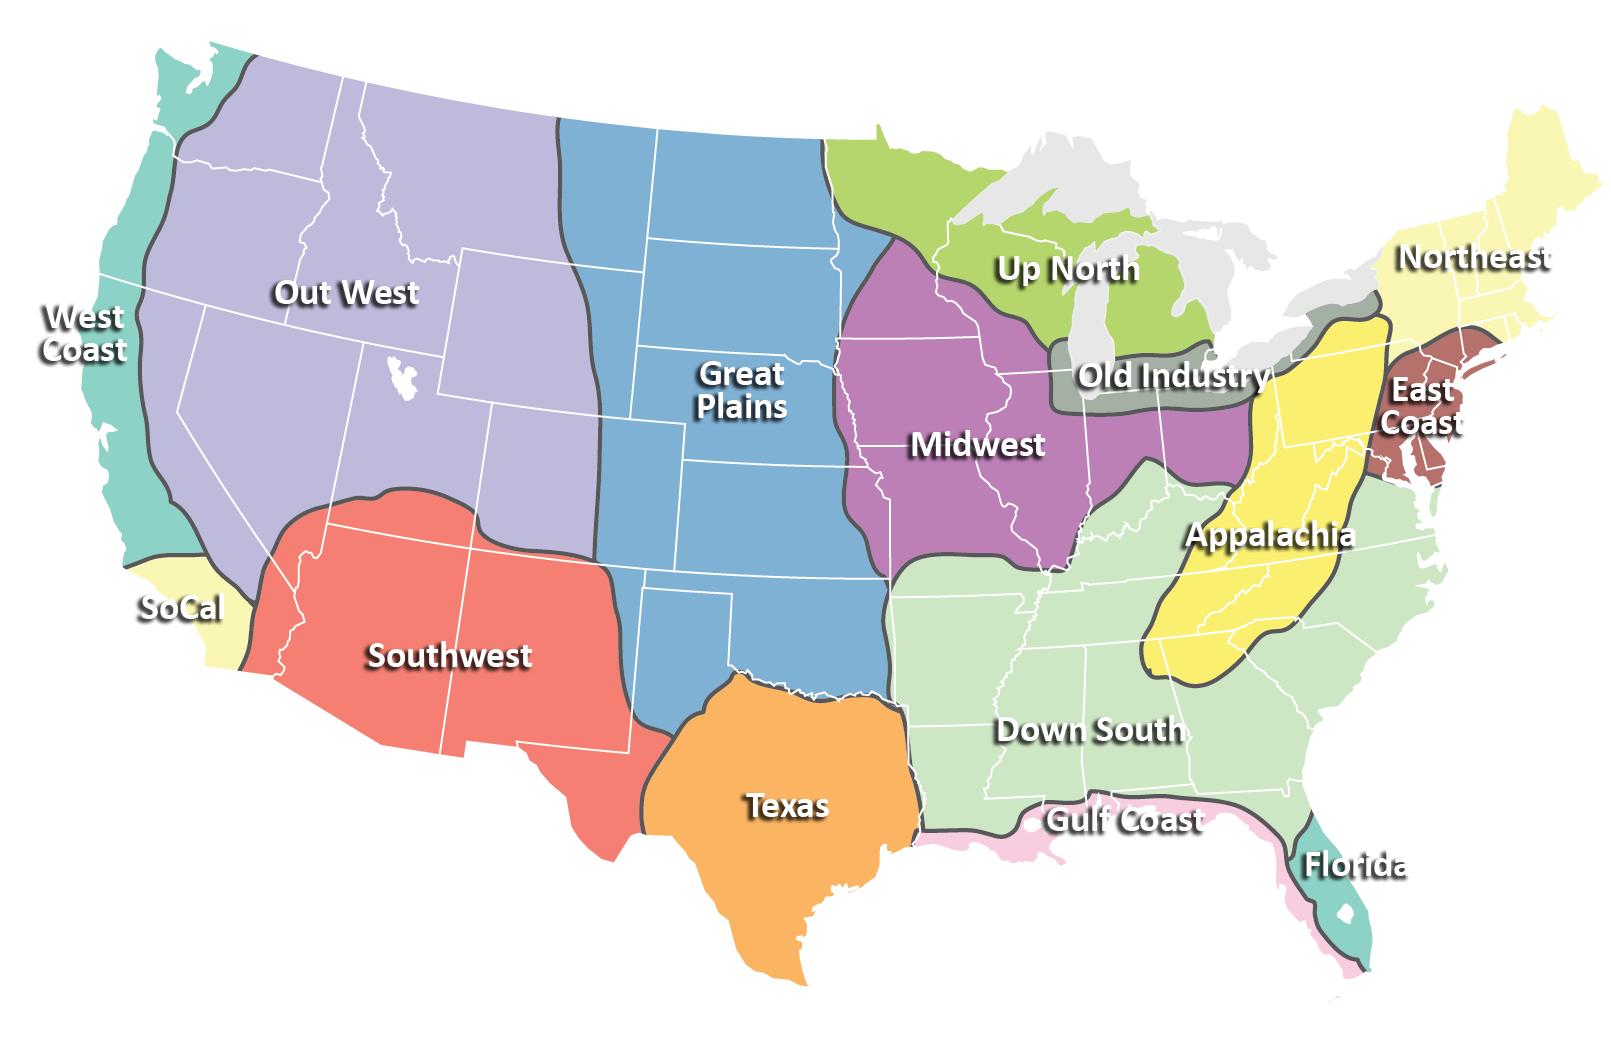 Bisexual accordingly to region